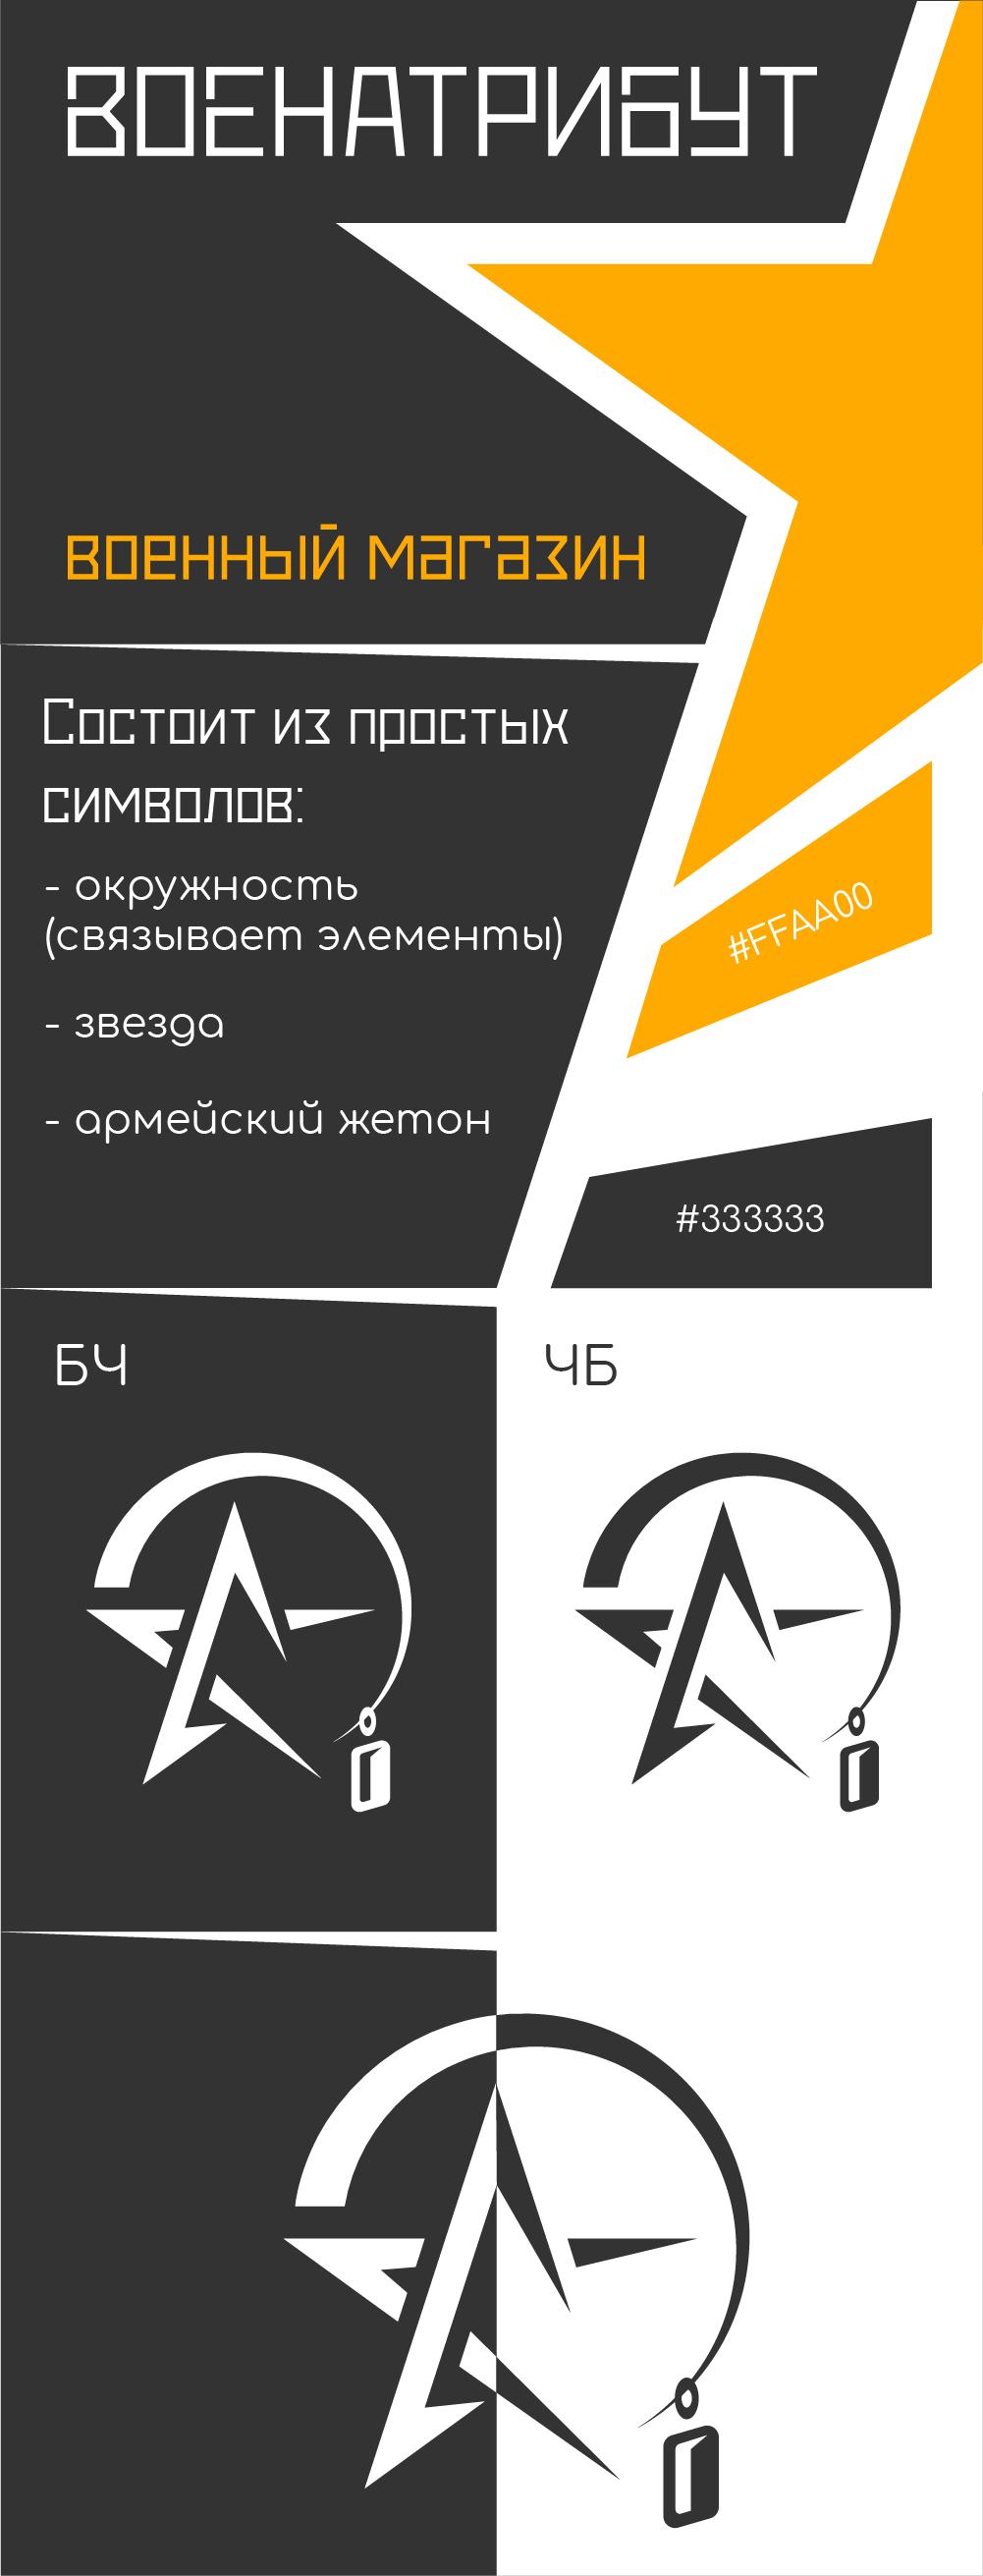 Разработка логотипа для компании военной тематики фото f_874601e882933805.jpg